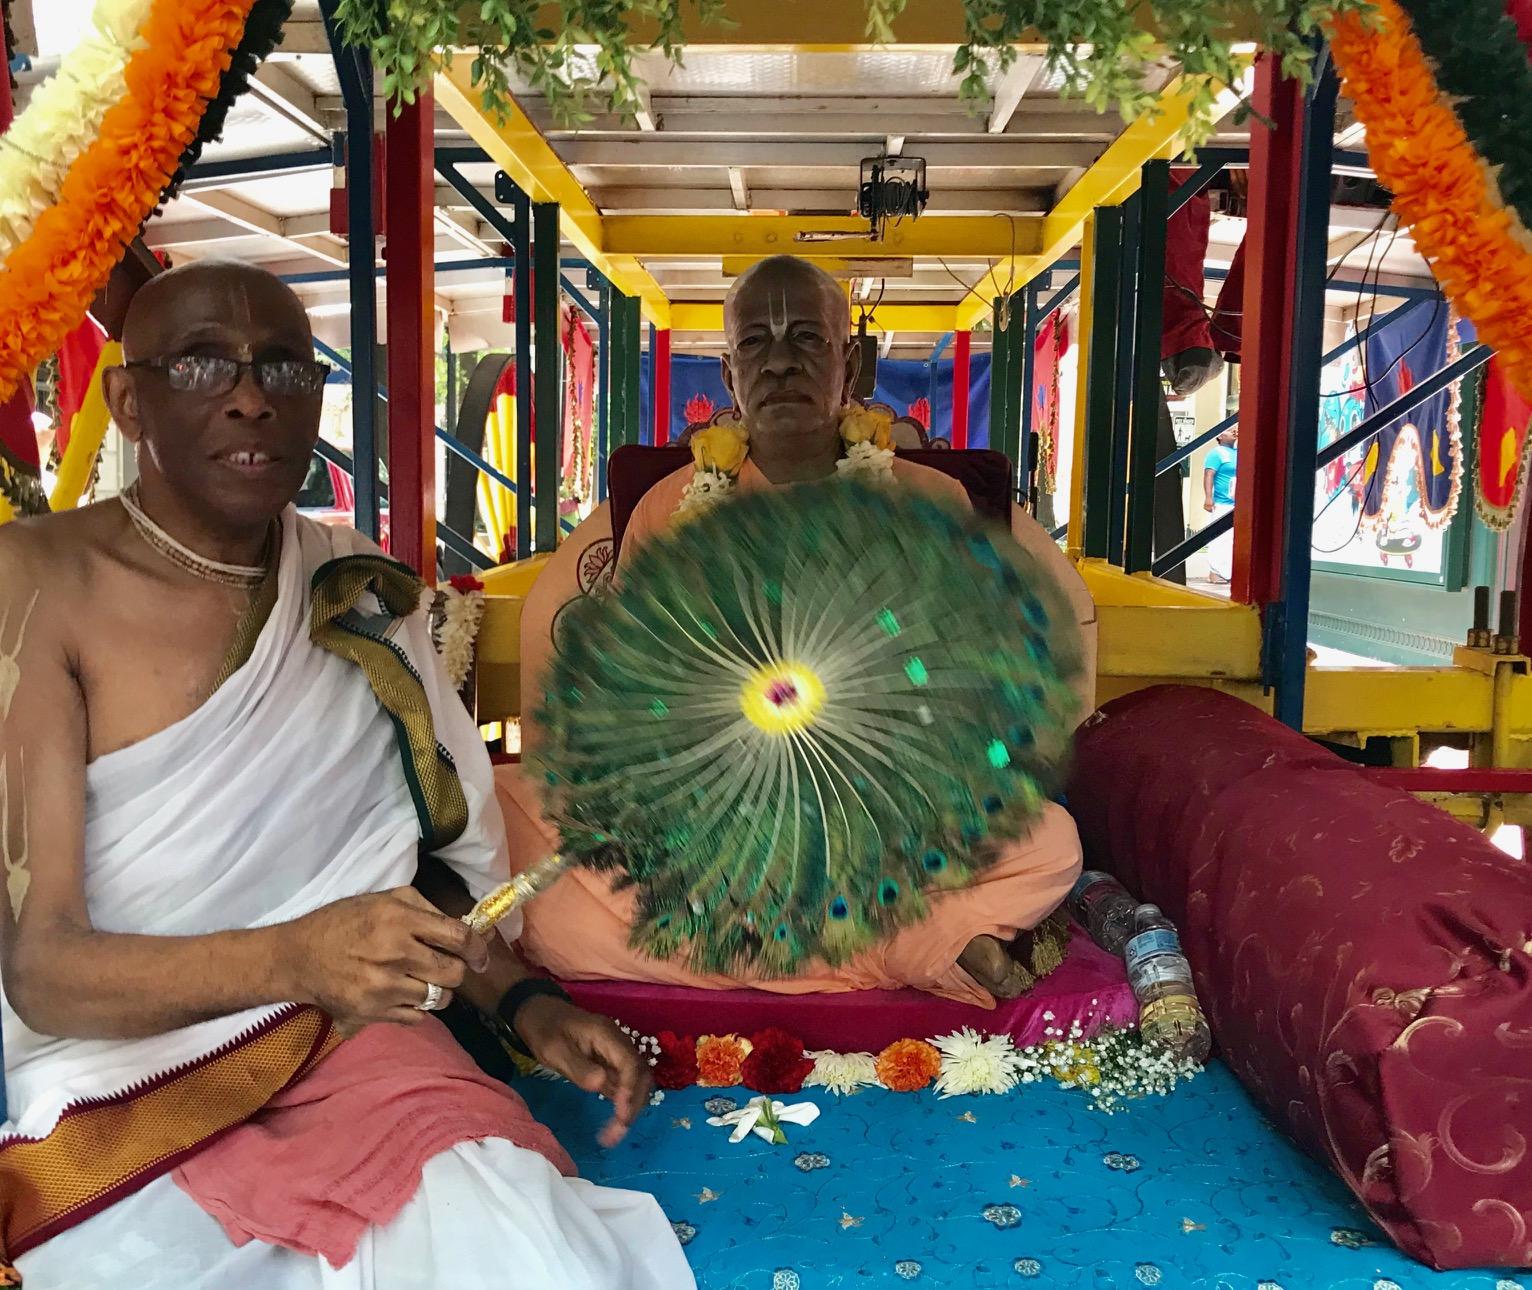 """Hare Krishna Festival of Chariots 2016 - 2019"